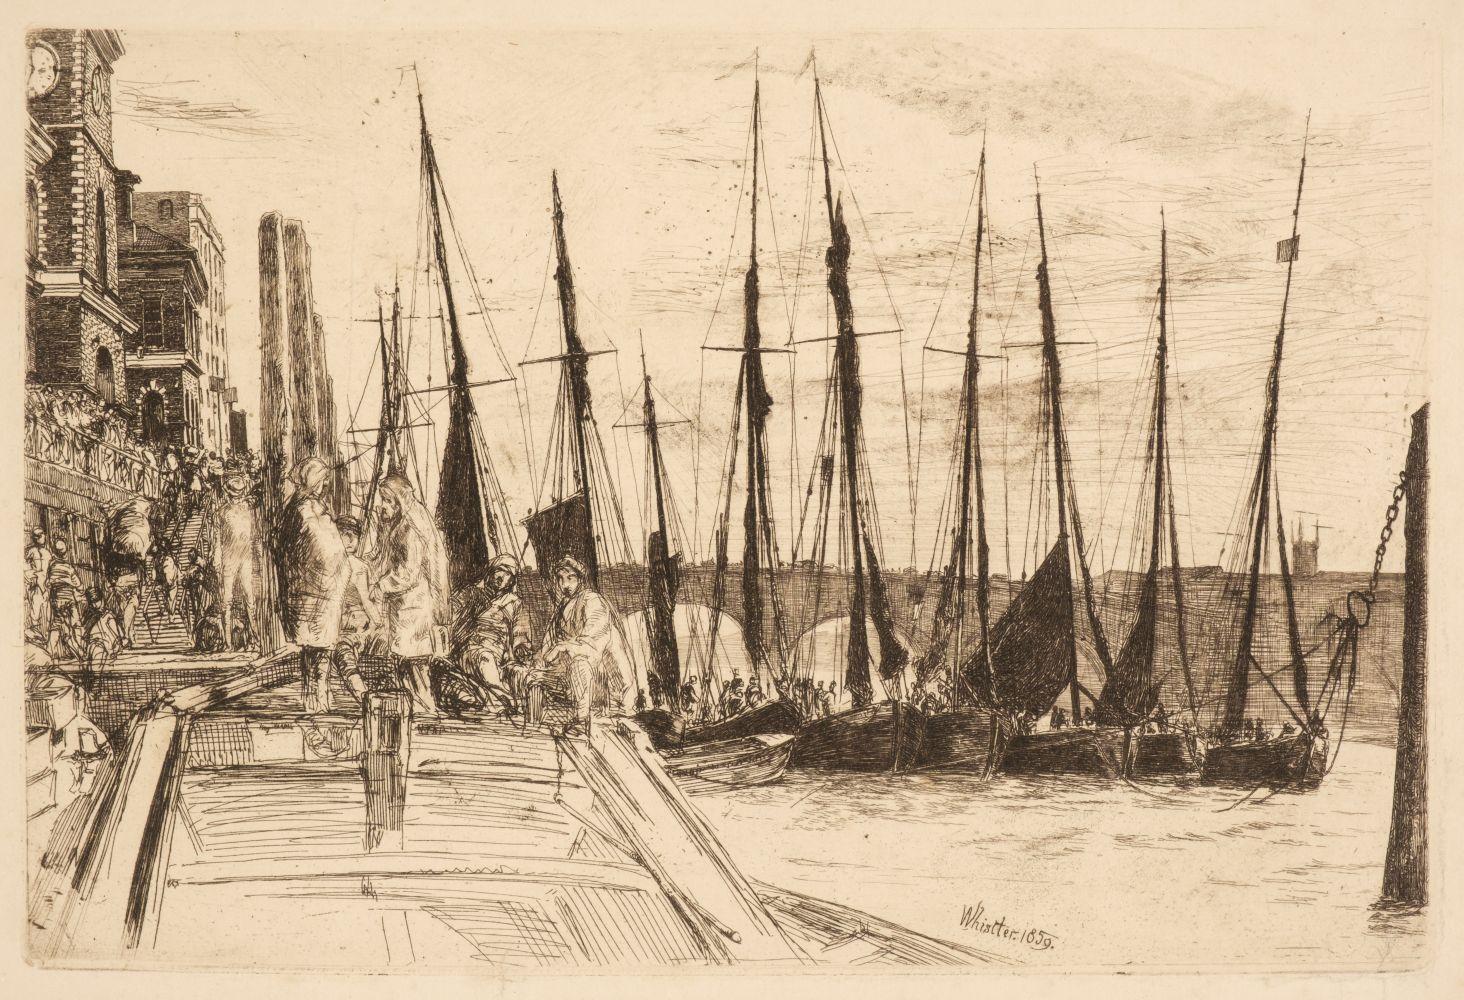 * Haden (Francis Seymour, 1818-1910). Battersea Reach, 1863 - Image 2 of 2